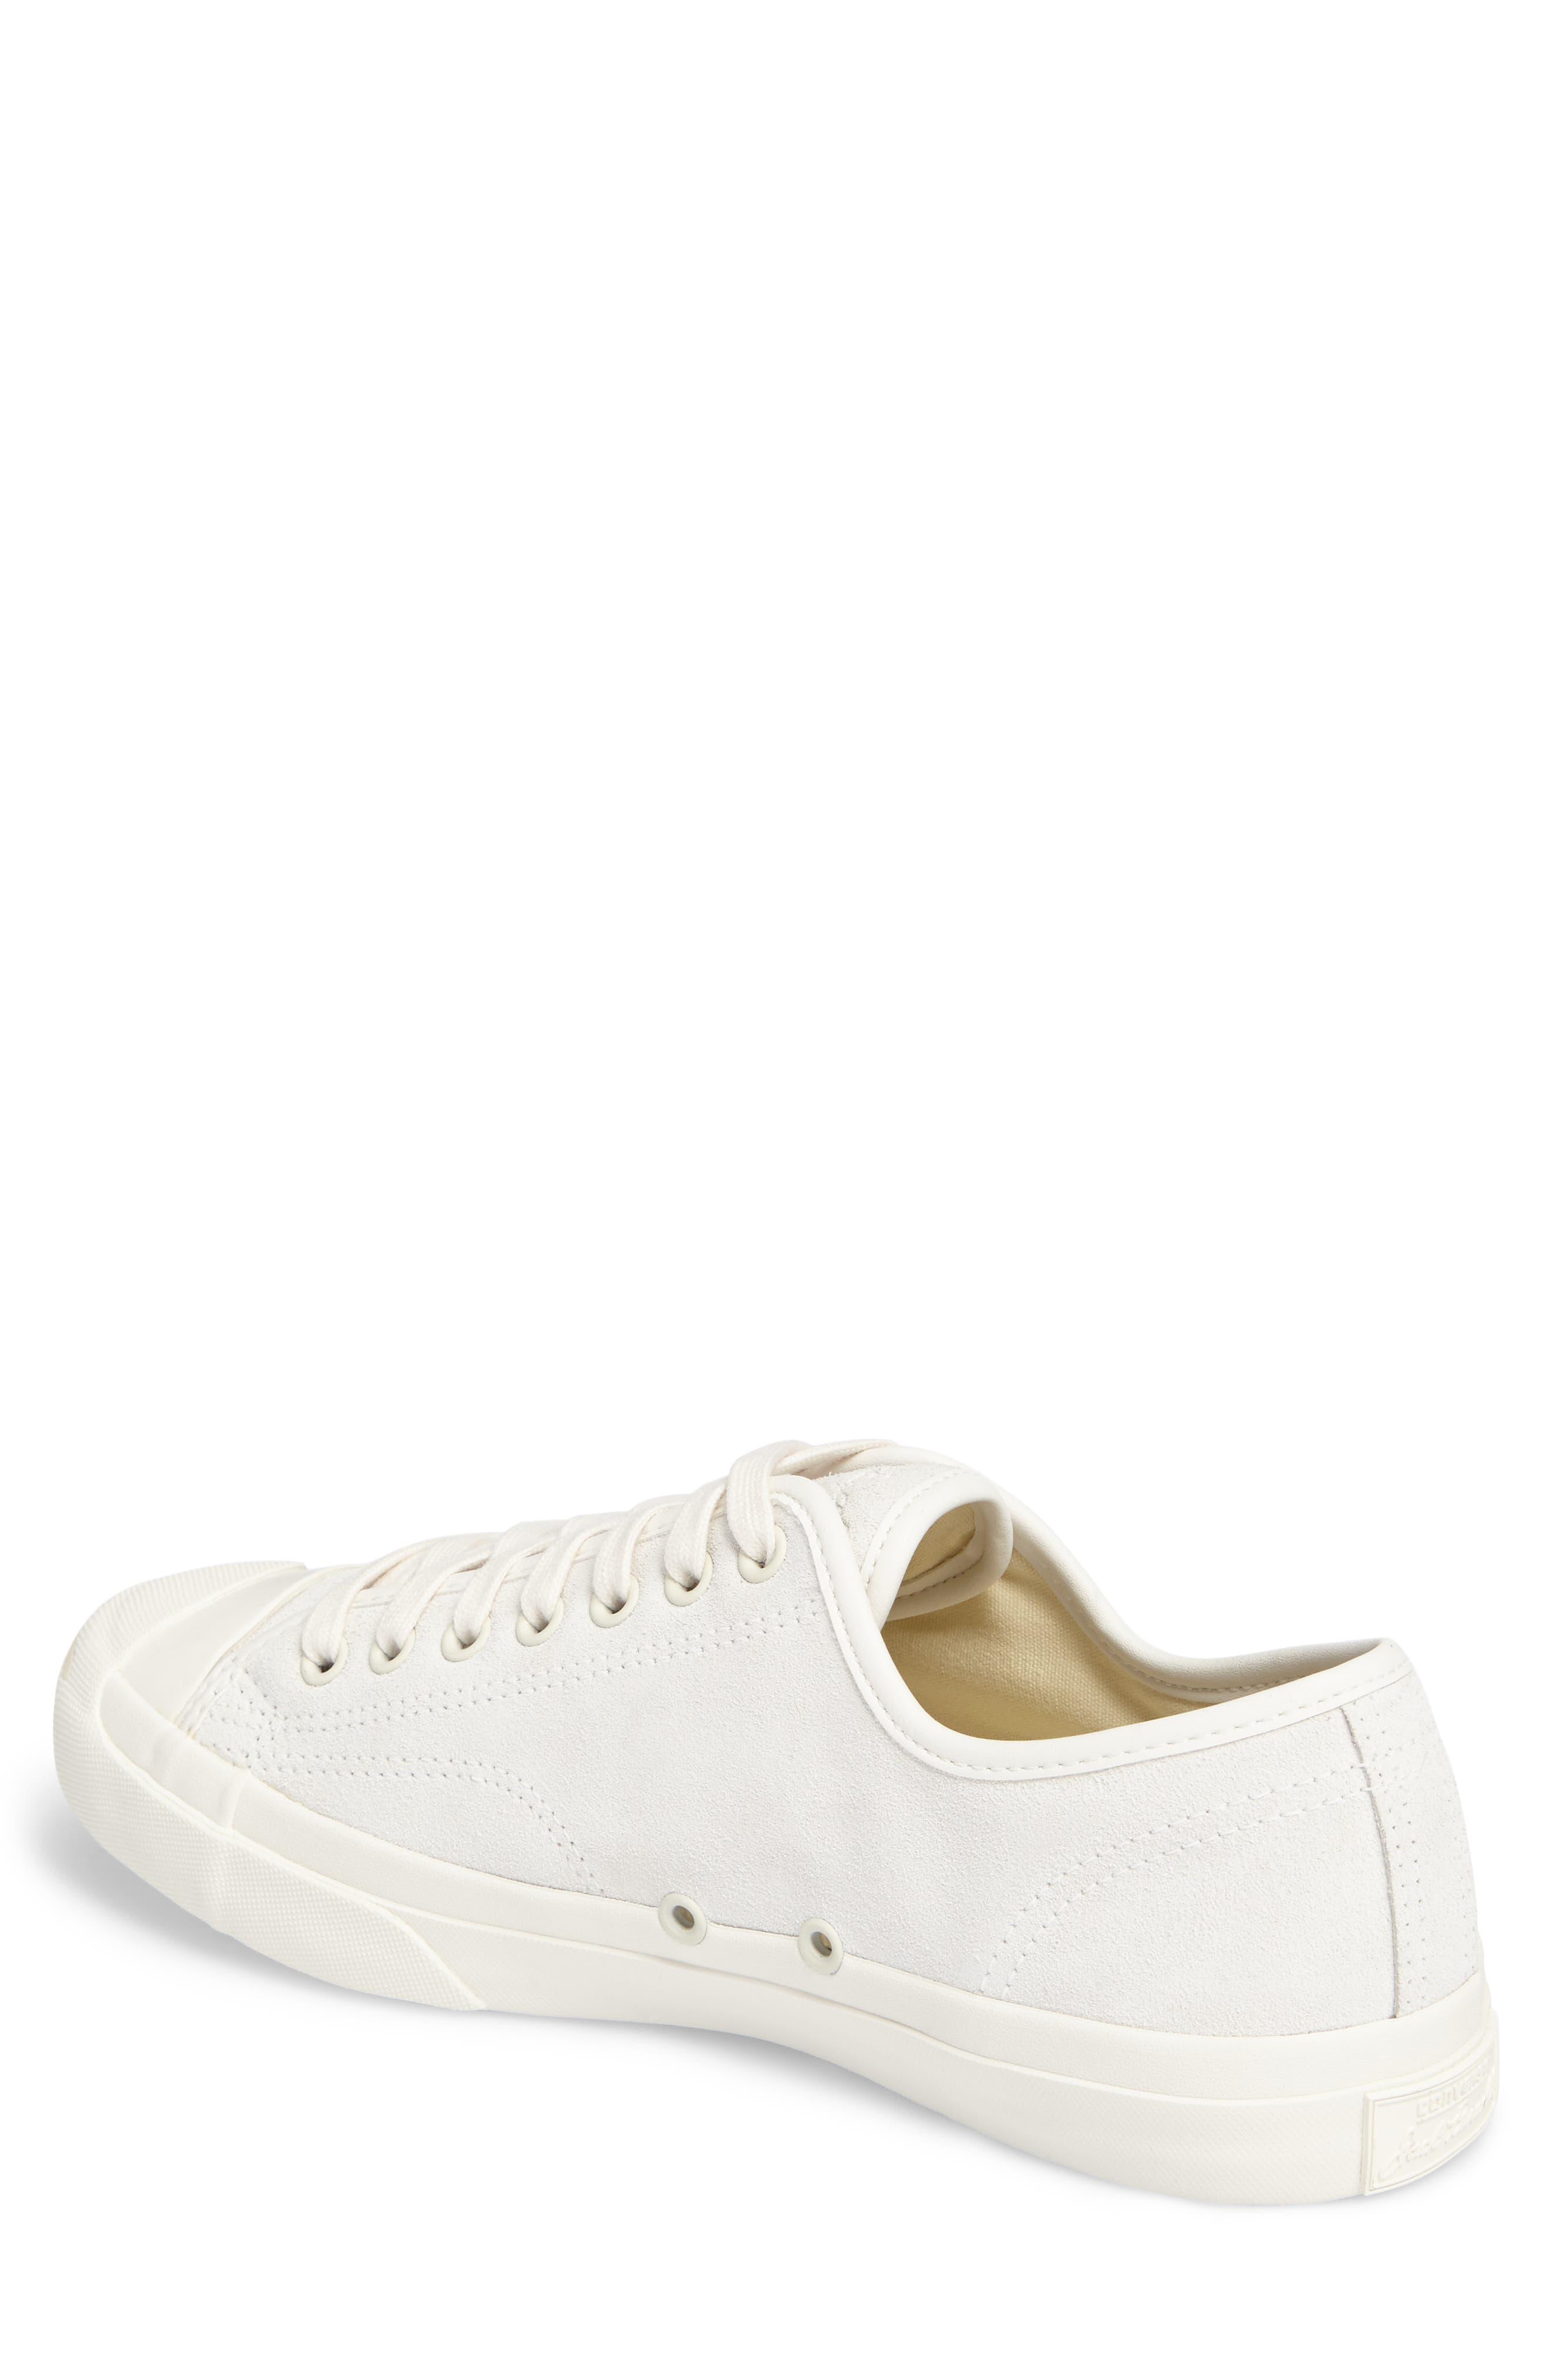 Jack Purcell Sneaker,                             Alternate thumbnail 2, color,                             020